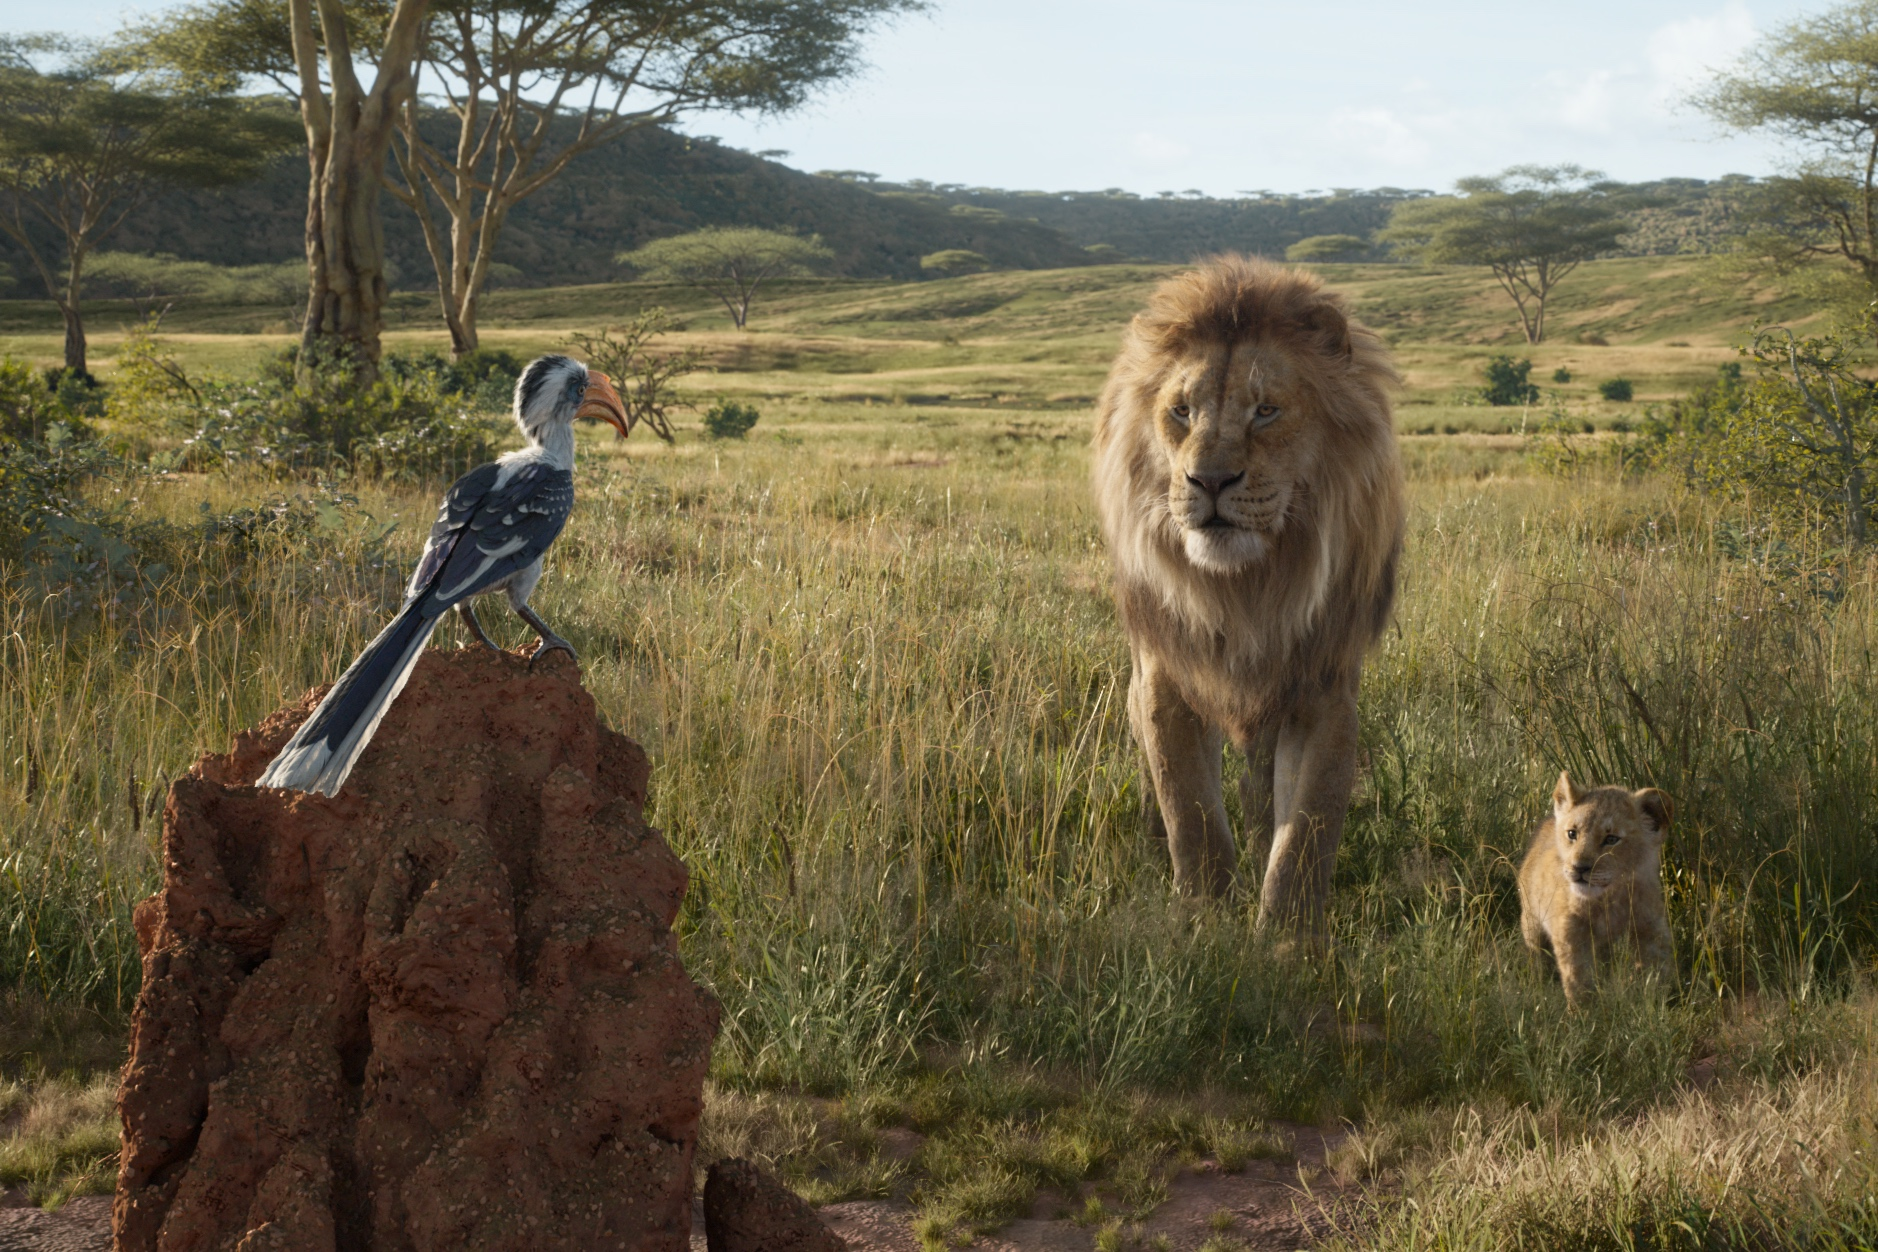 Mufasa (Jones) and Simba (McCary) chatting with Zazu (Oliver).